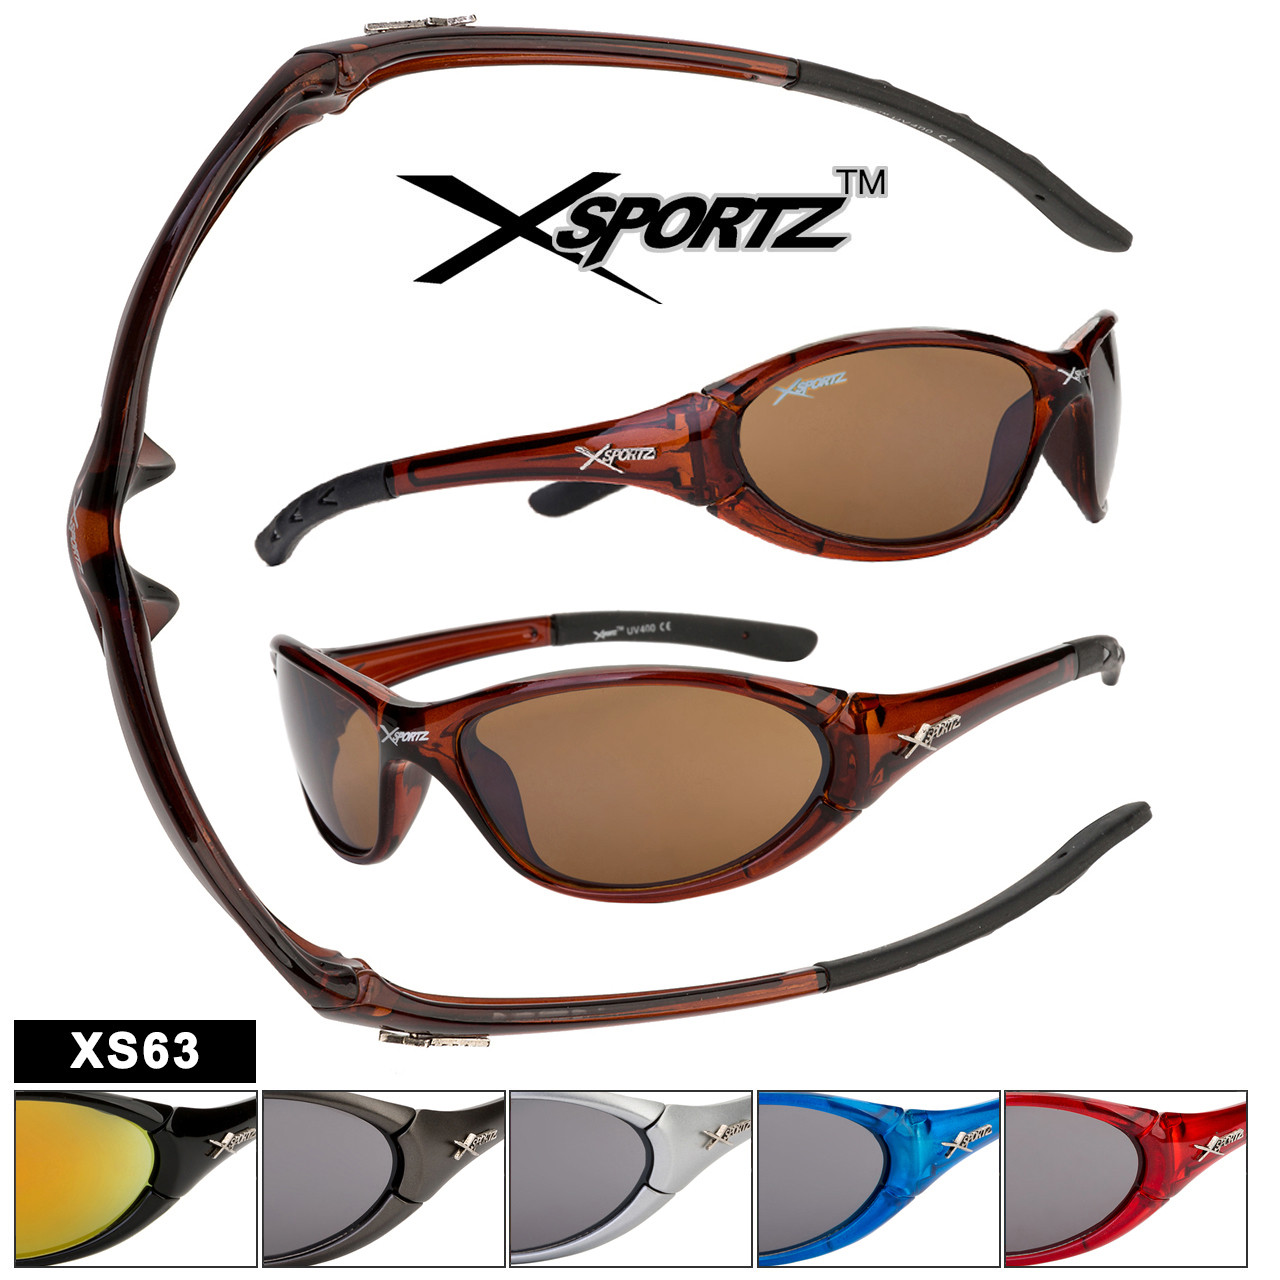 Xsportz Sport Sunglasses XS63